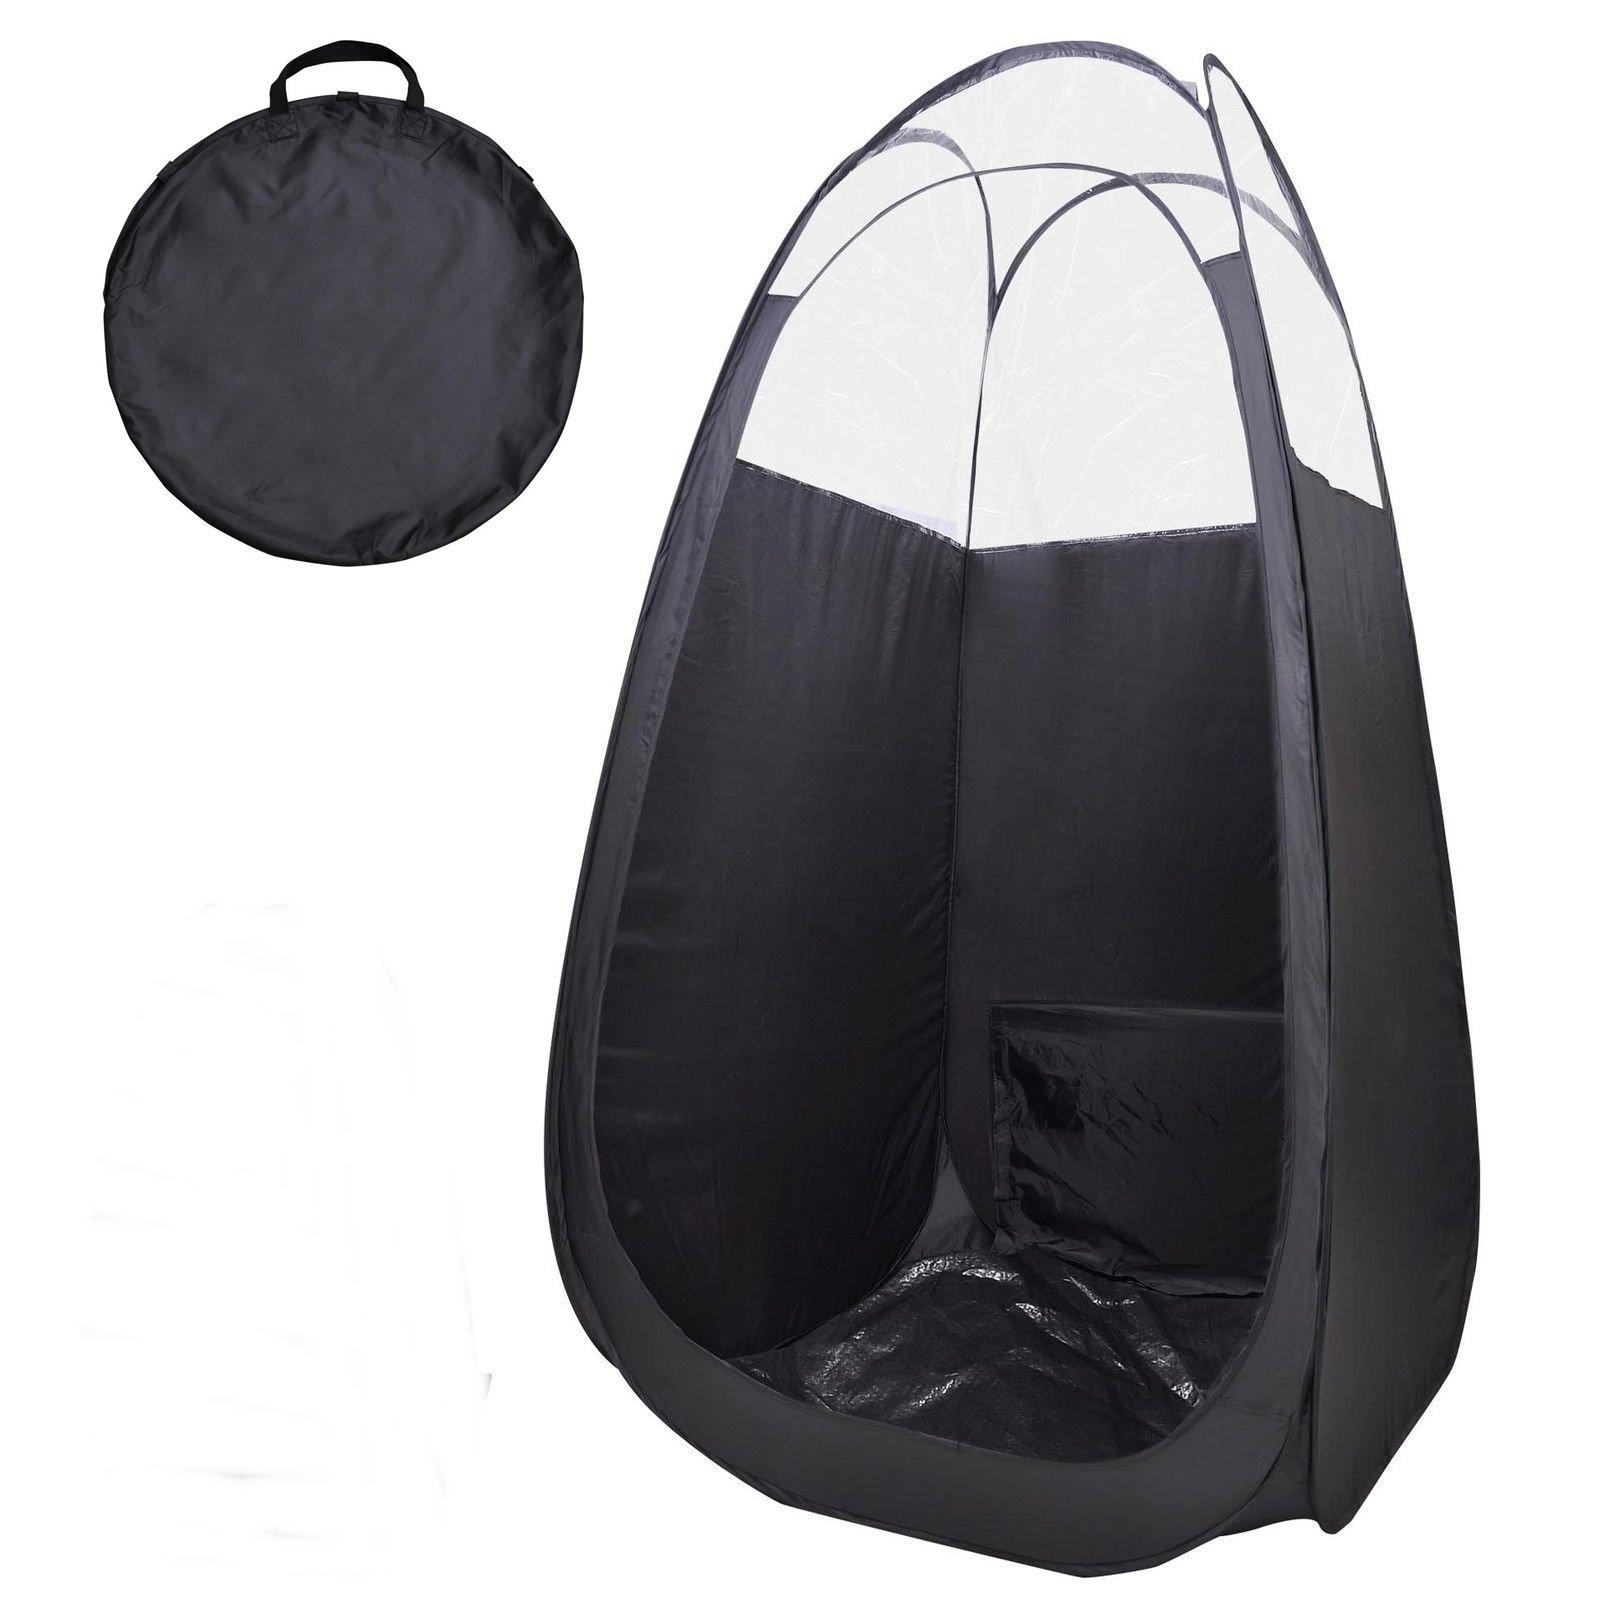 Black Portable Pop Up Spray tanning tent